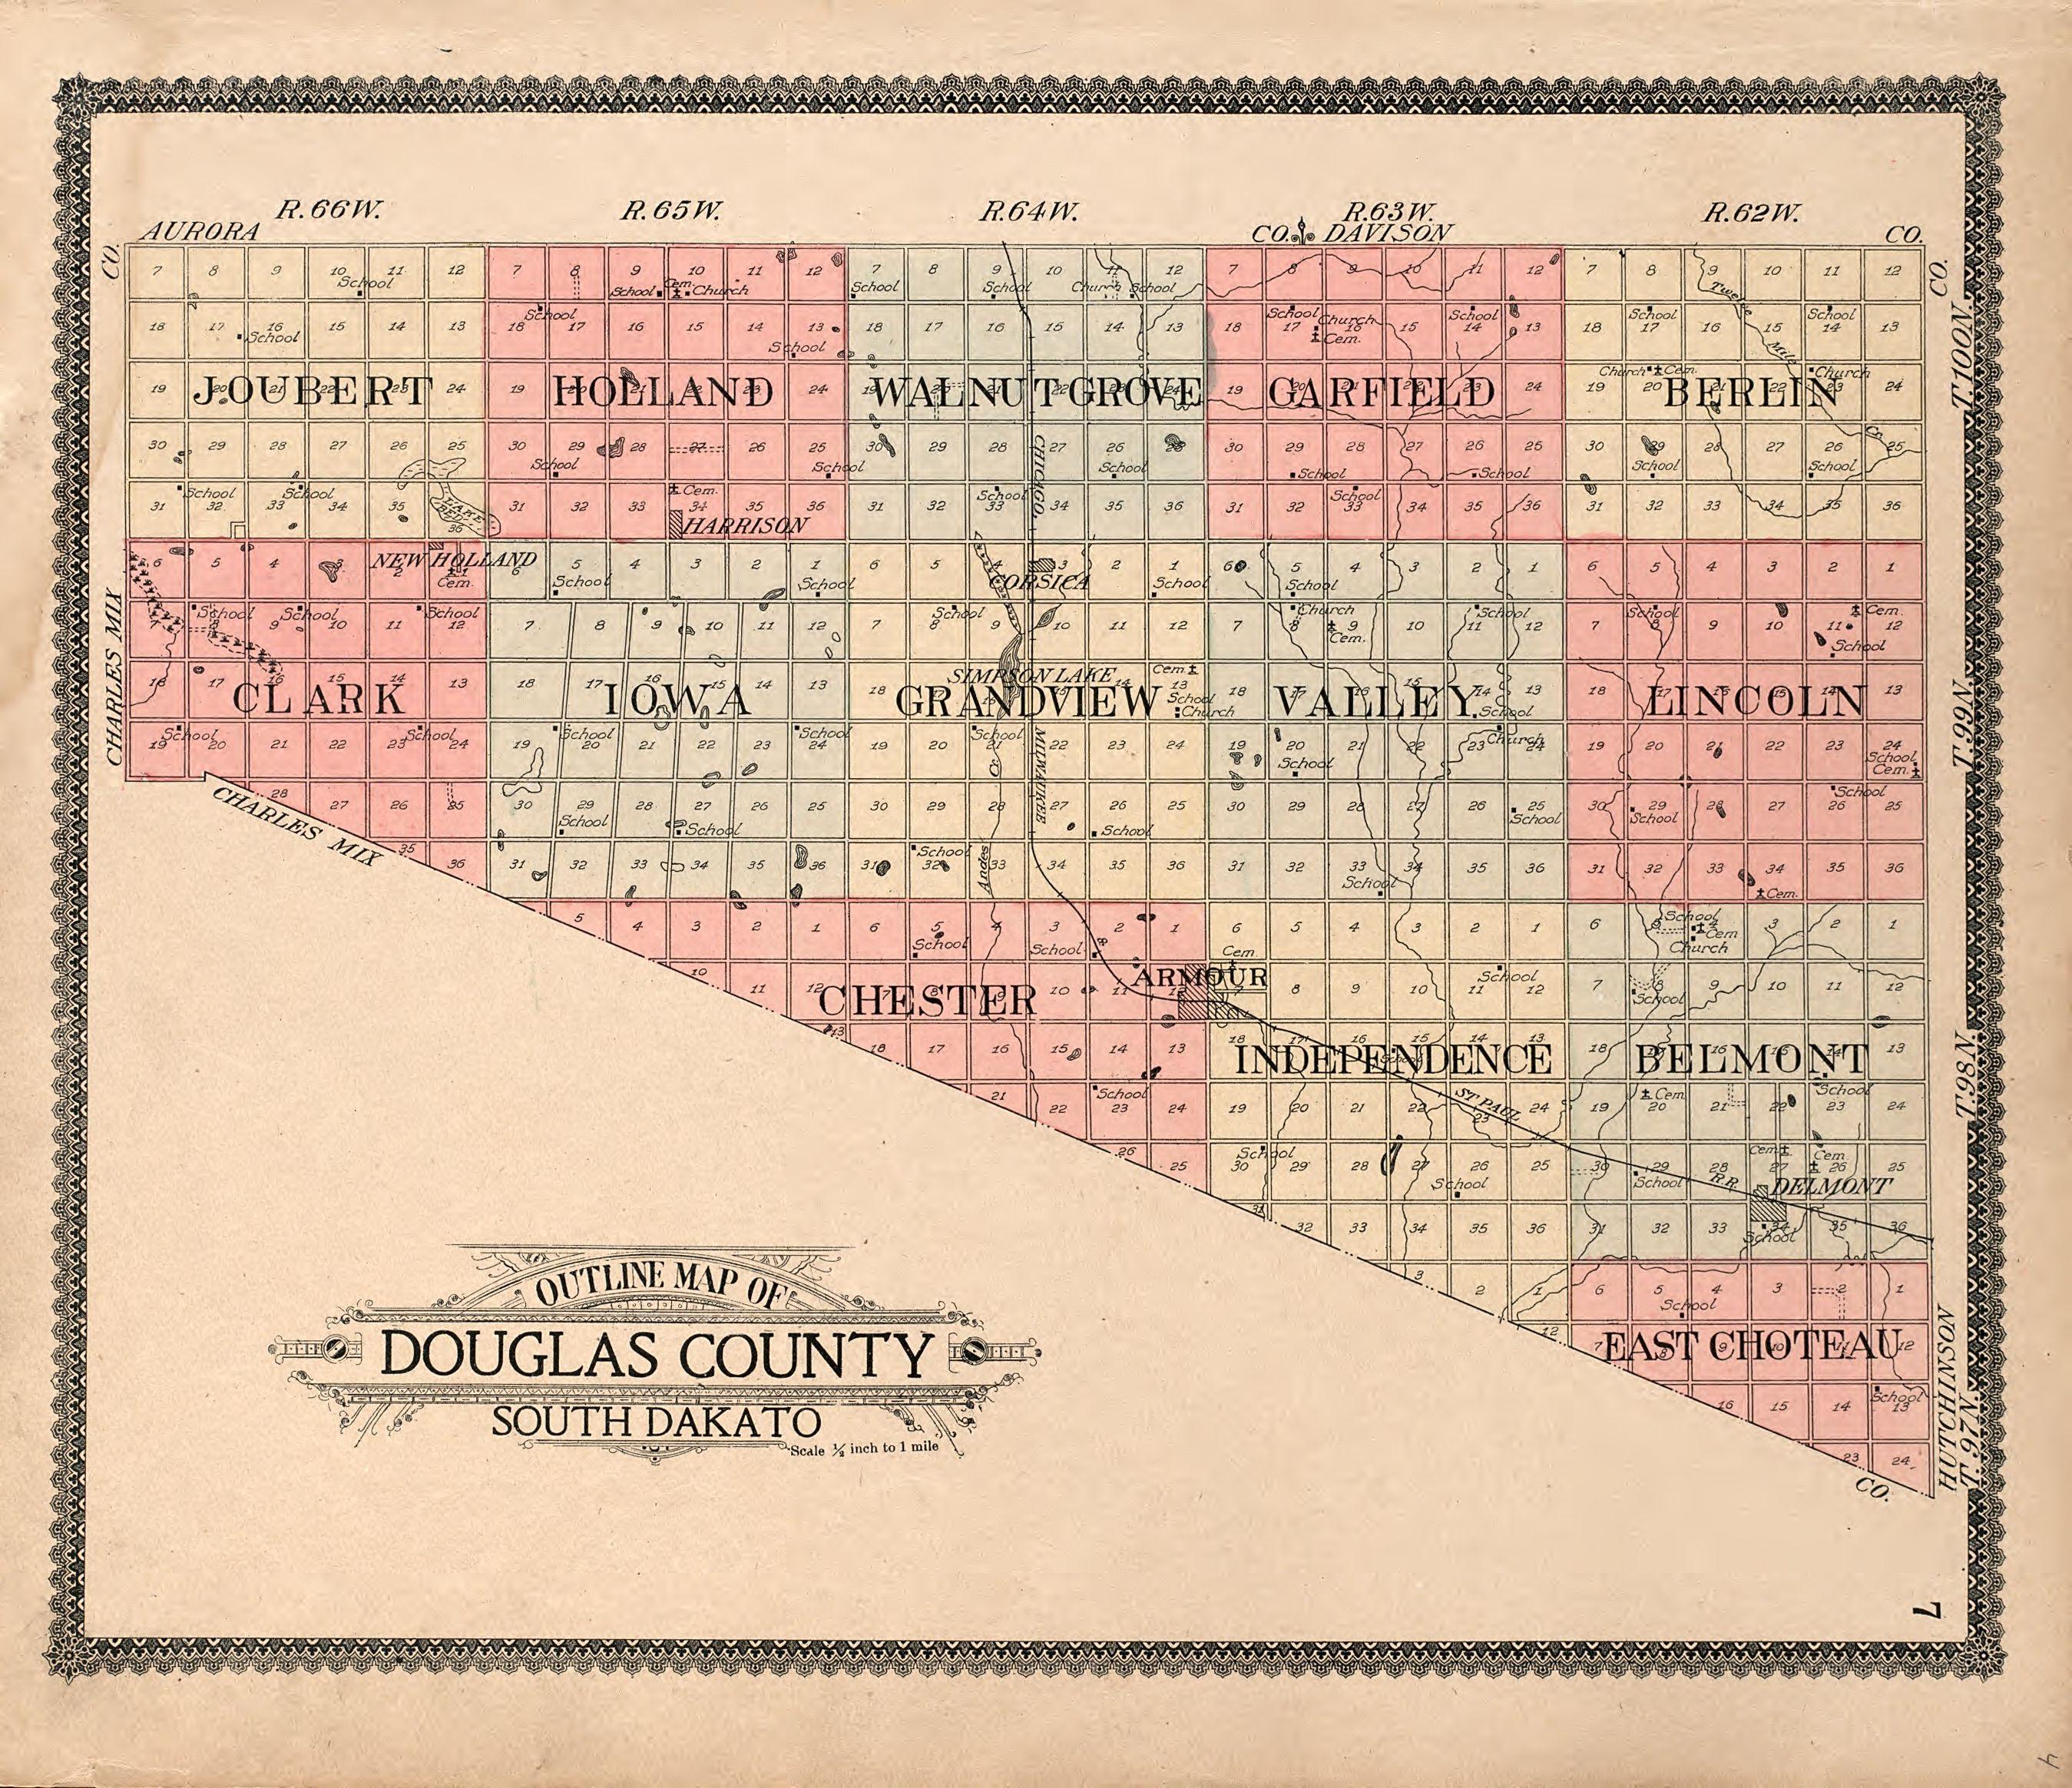 File:Standard atlas of Douglas County, South Dakota ... on douglas county colorado map, littleton plat map, douglas county mo gis mapping, douglas county mo map, douglas county wi land maps, douglas county parcel map, swift county mn map, douglas county soil map, ne county map, douglas az map, douglas county ne, douglas county survey maps, douglas county mn map, douglas county georgia map, douglas county plat book, portland plat map, douglas county nebraska, madison county ny map, douglas county road map, cass county nebraska map,